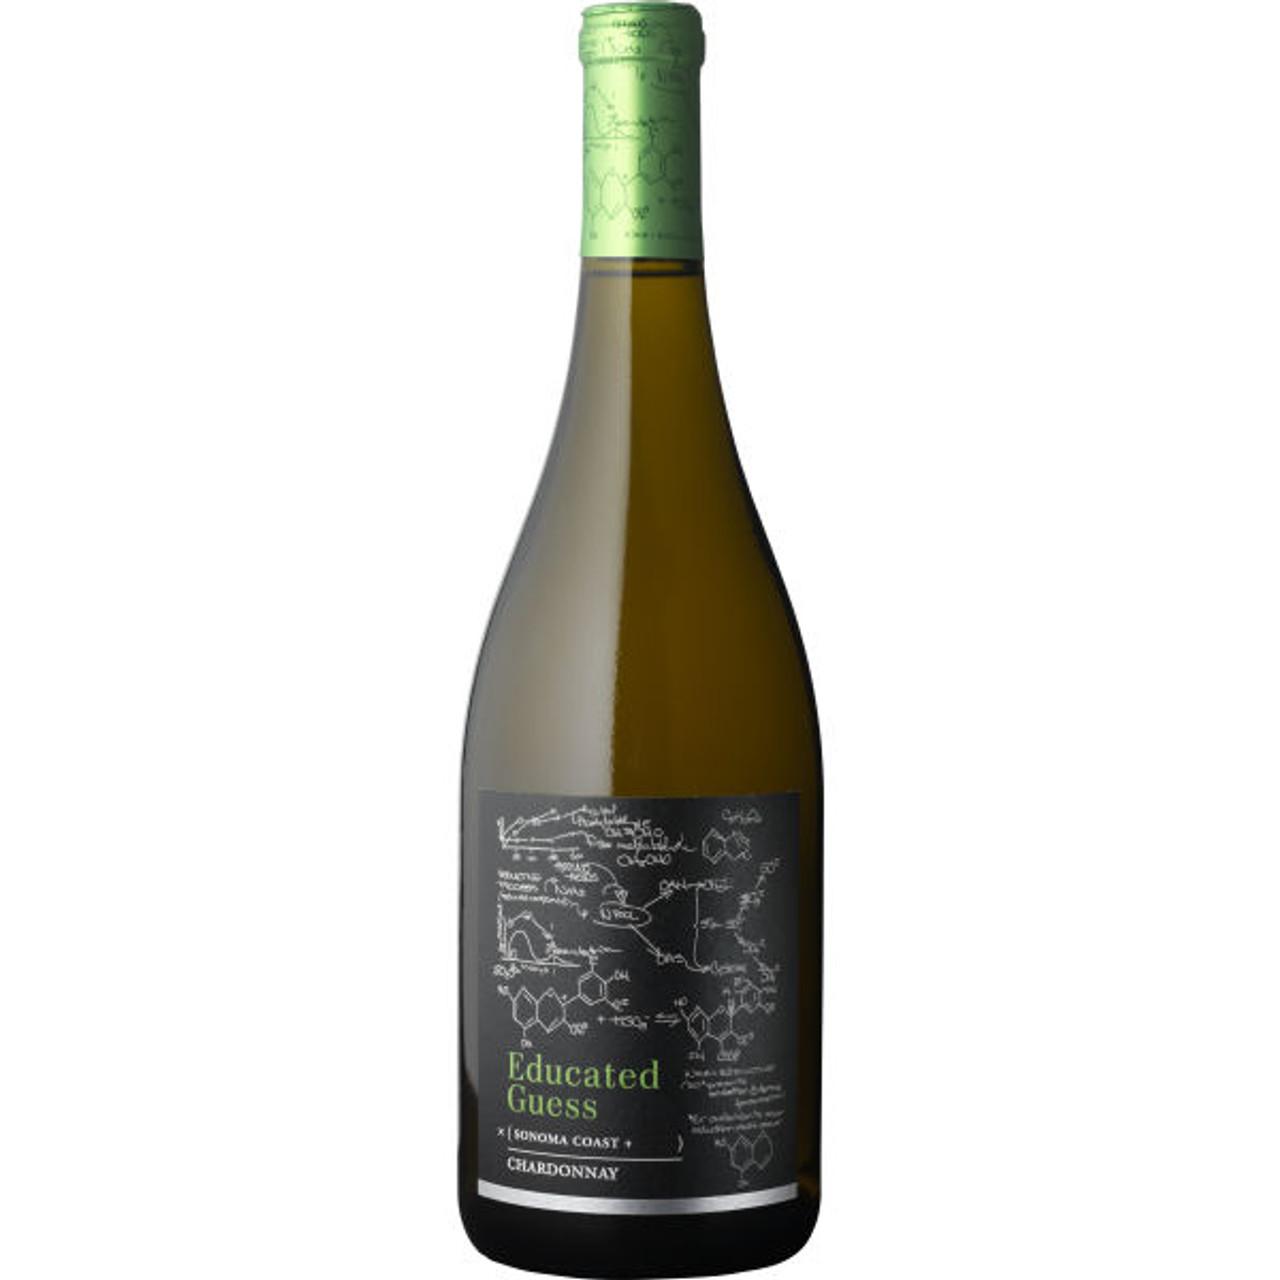 Educated Guess Sonoma Coast Chardonnay